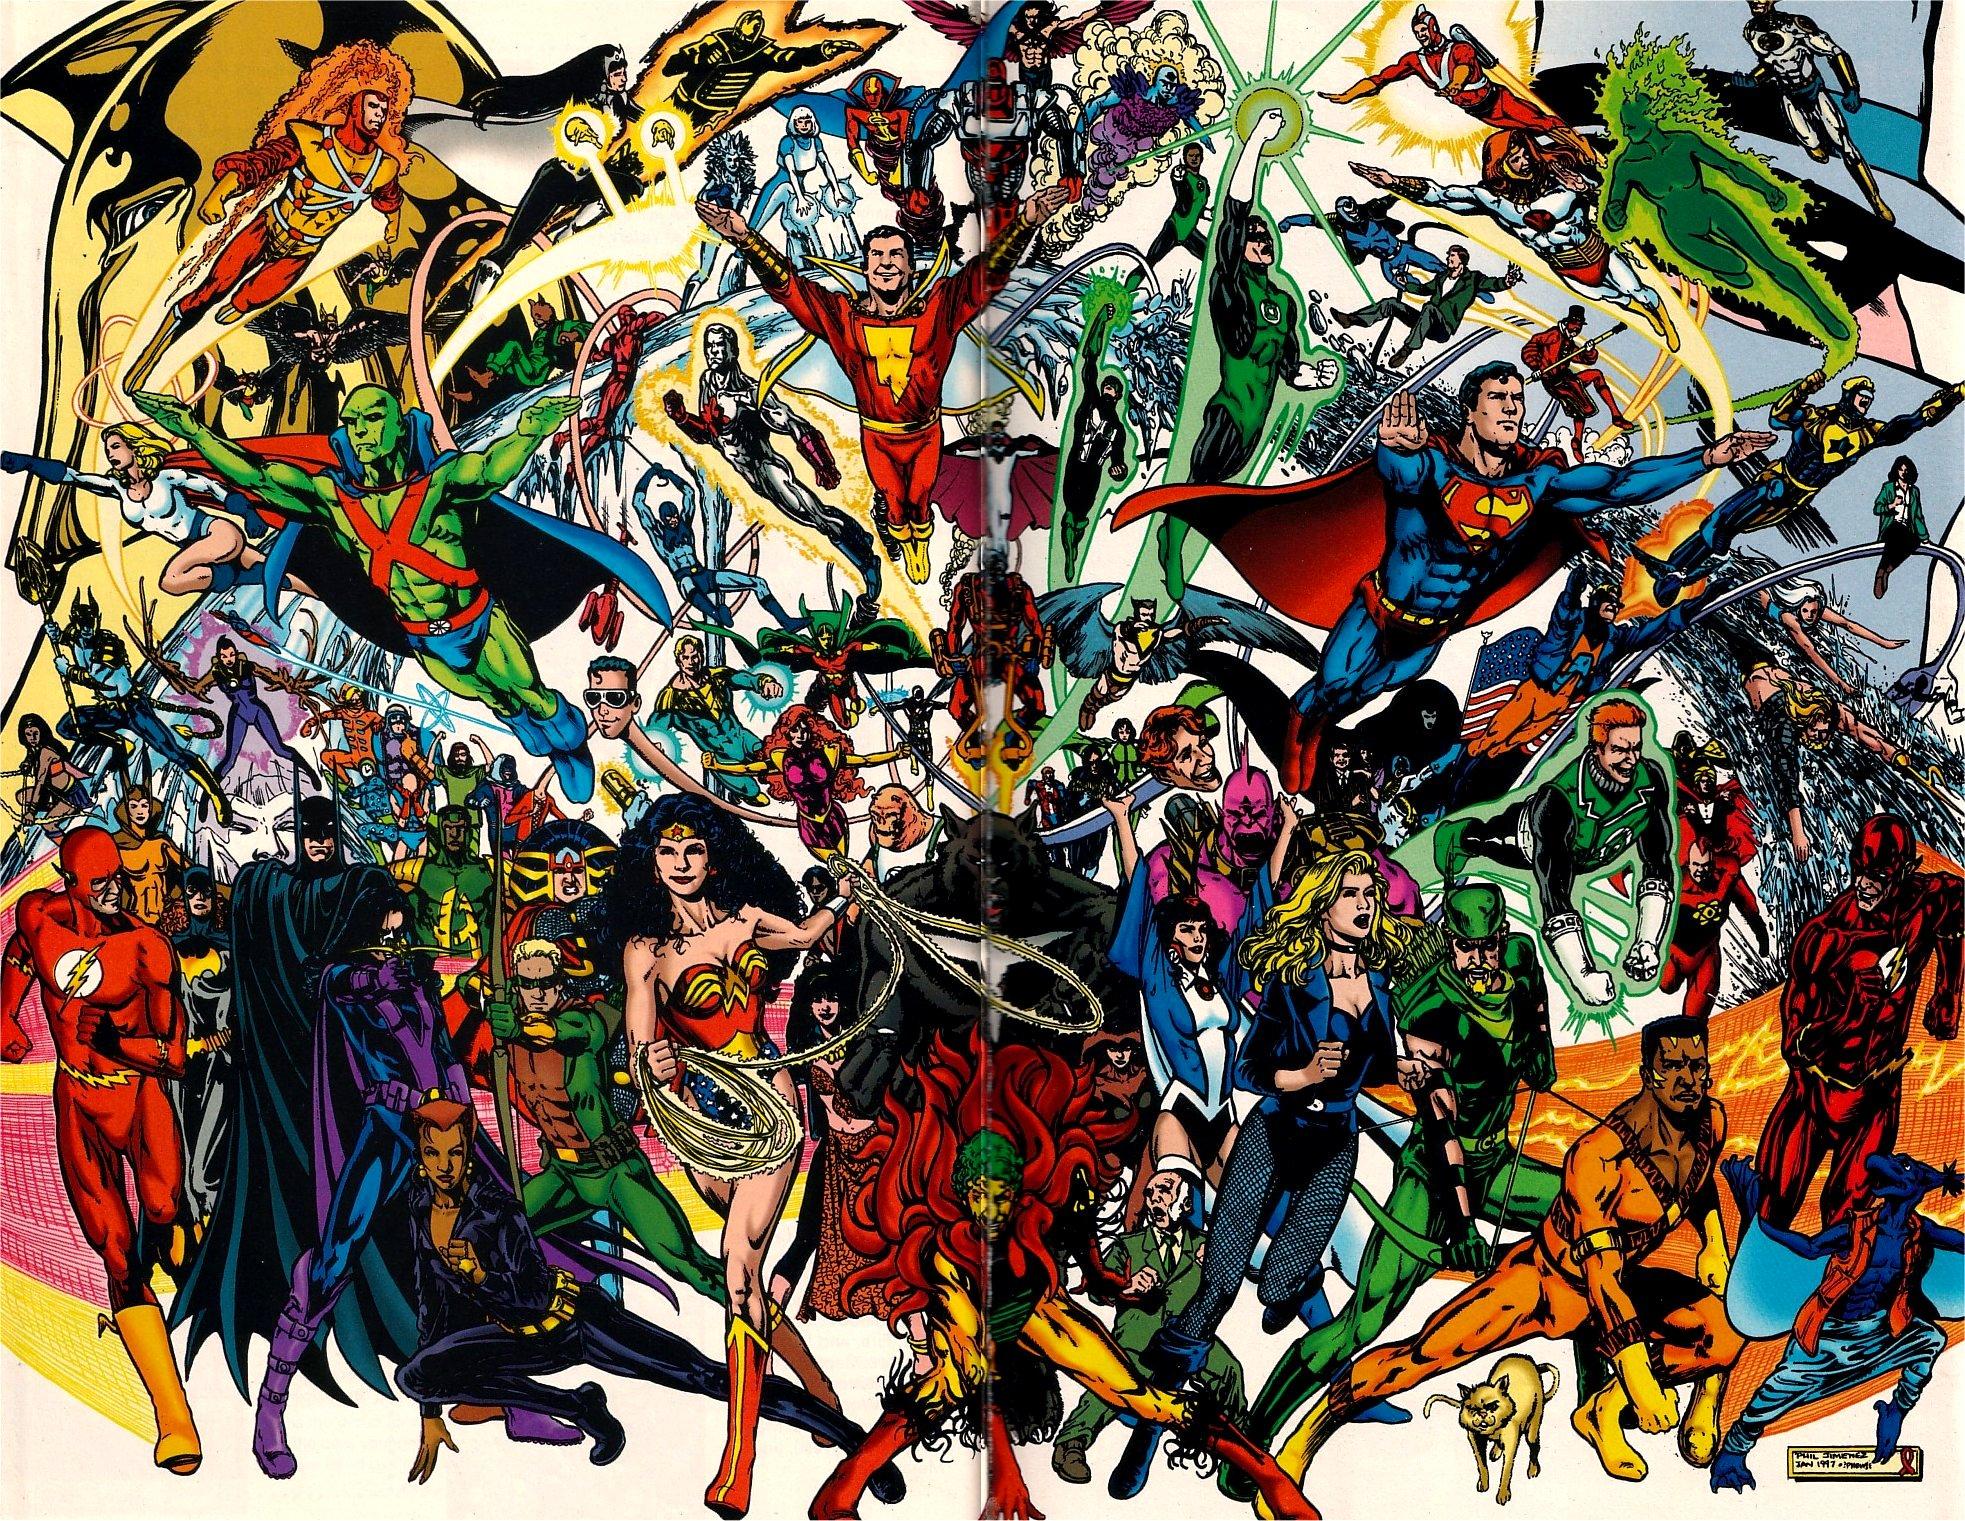 Image - Justice League 0010.jpg - DC Comics Database